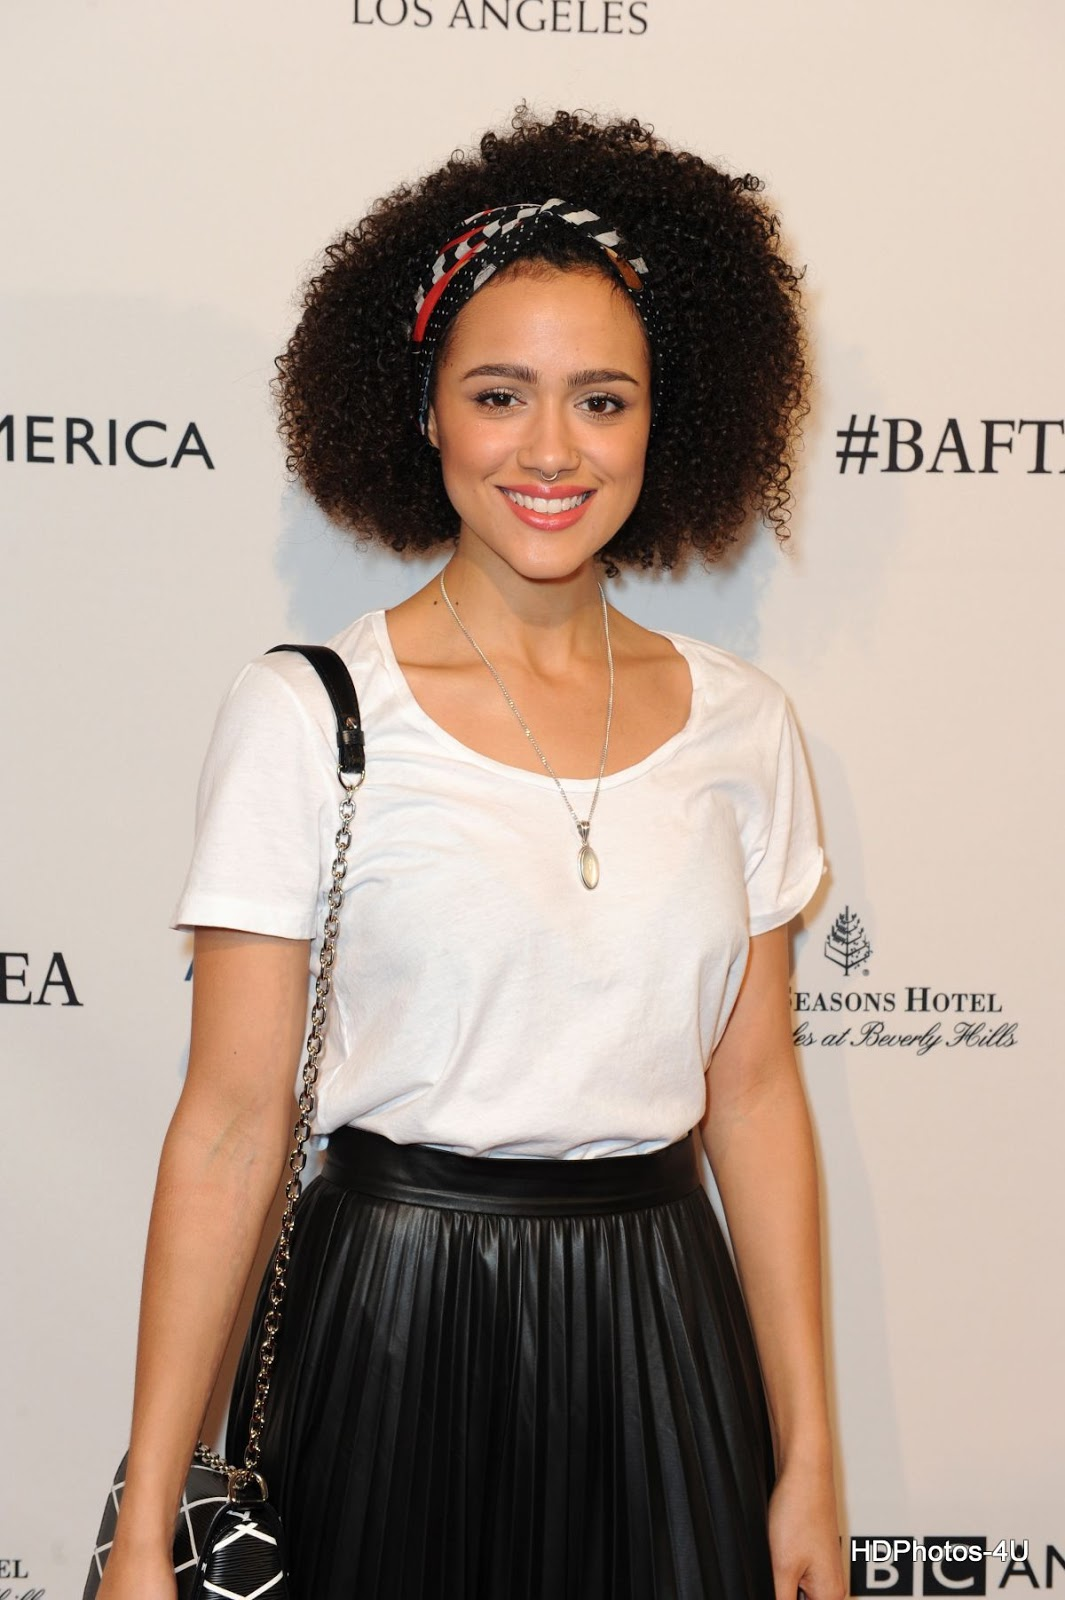 HD Photos of 'Fast 8' actress Nathalie Emmanuel at BAFTA Los Angeles Awards Season Tea in Los Angeles